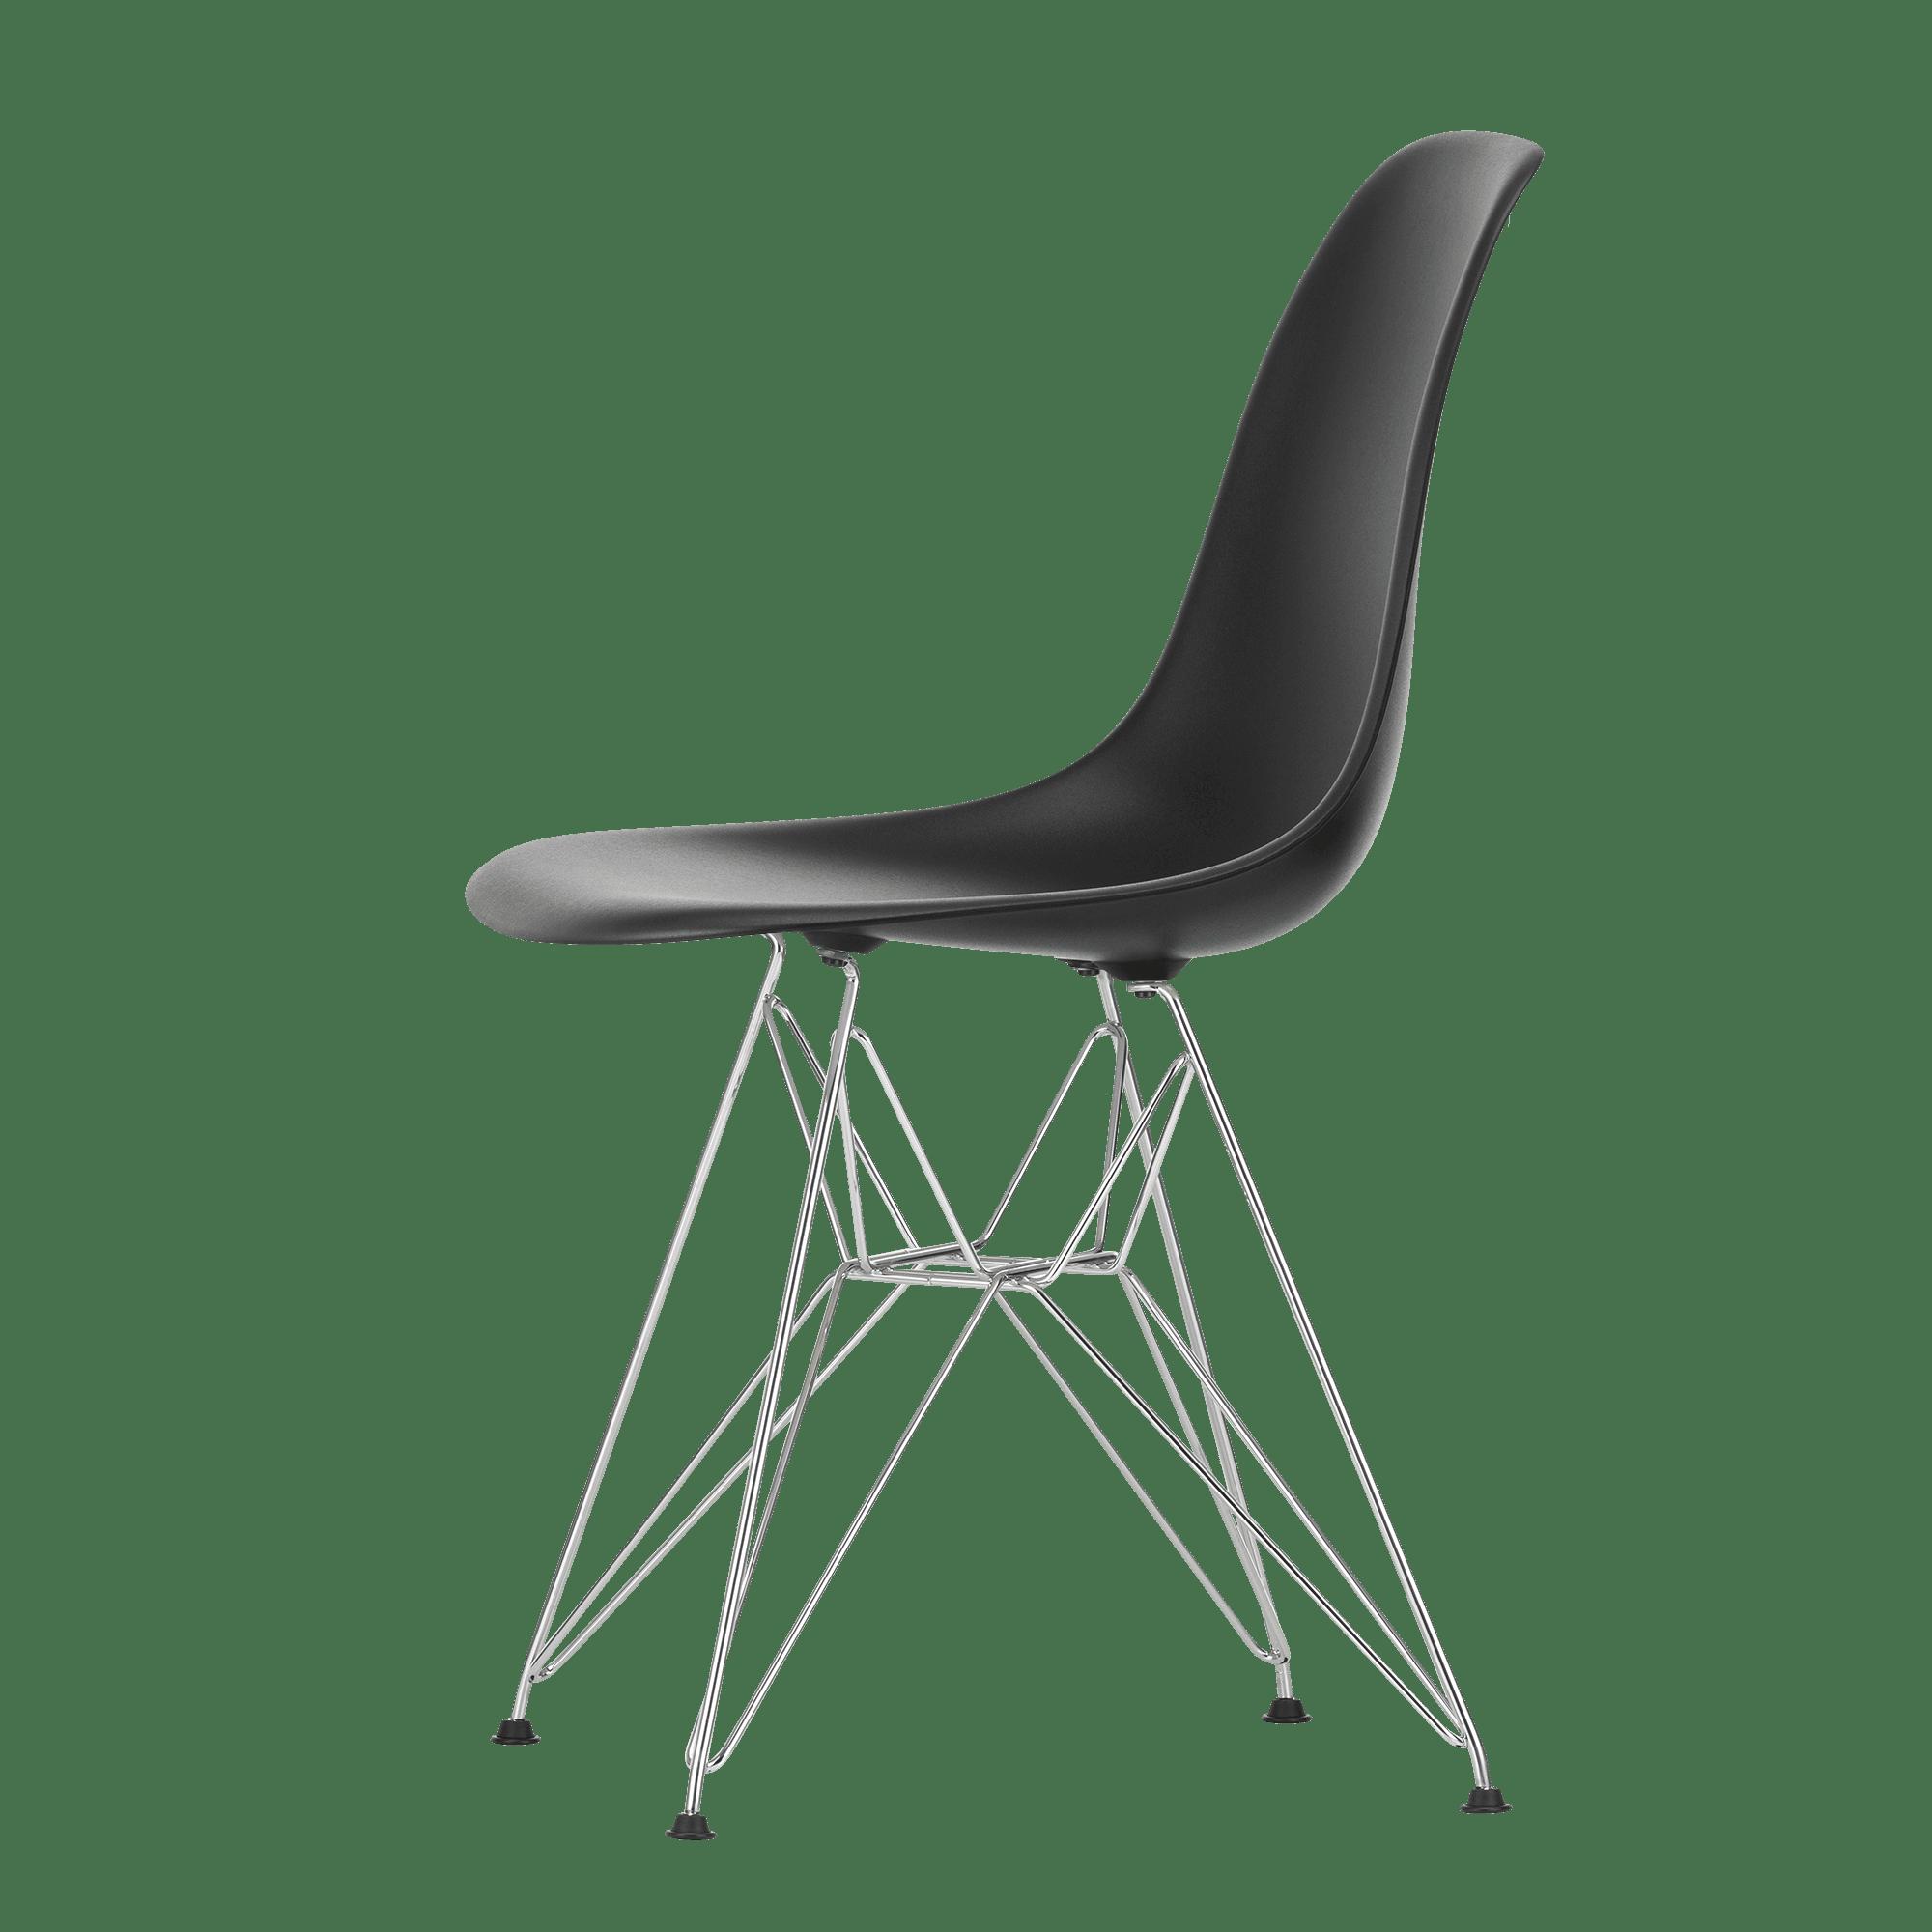 Eames Plastic Sidechair Dsr Von Vitra Minimum